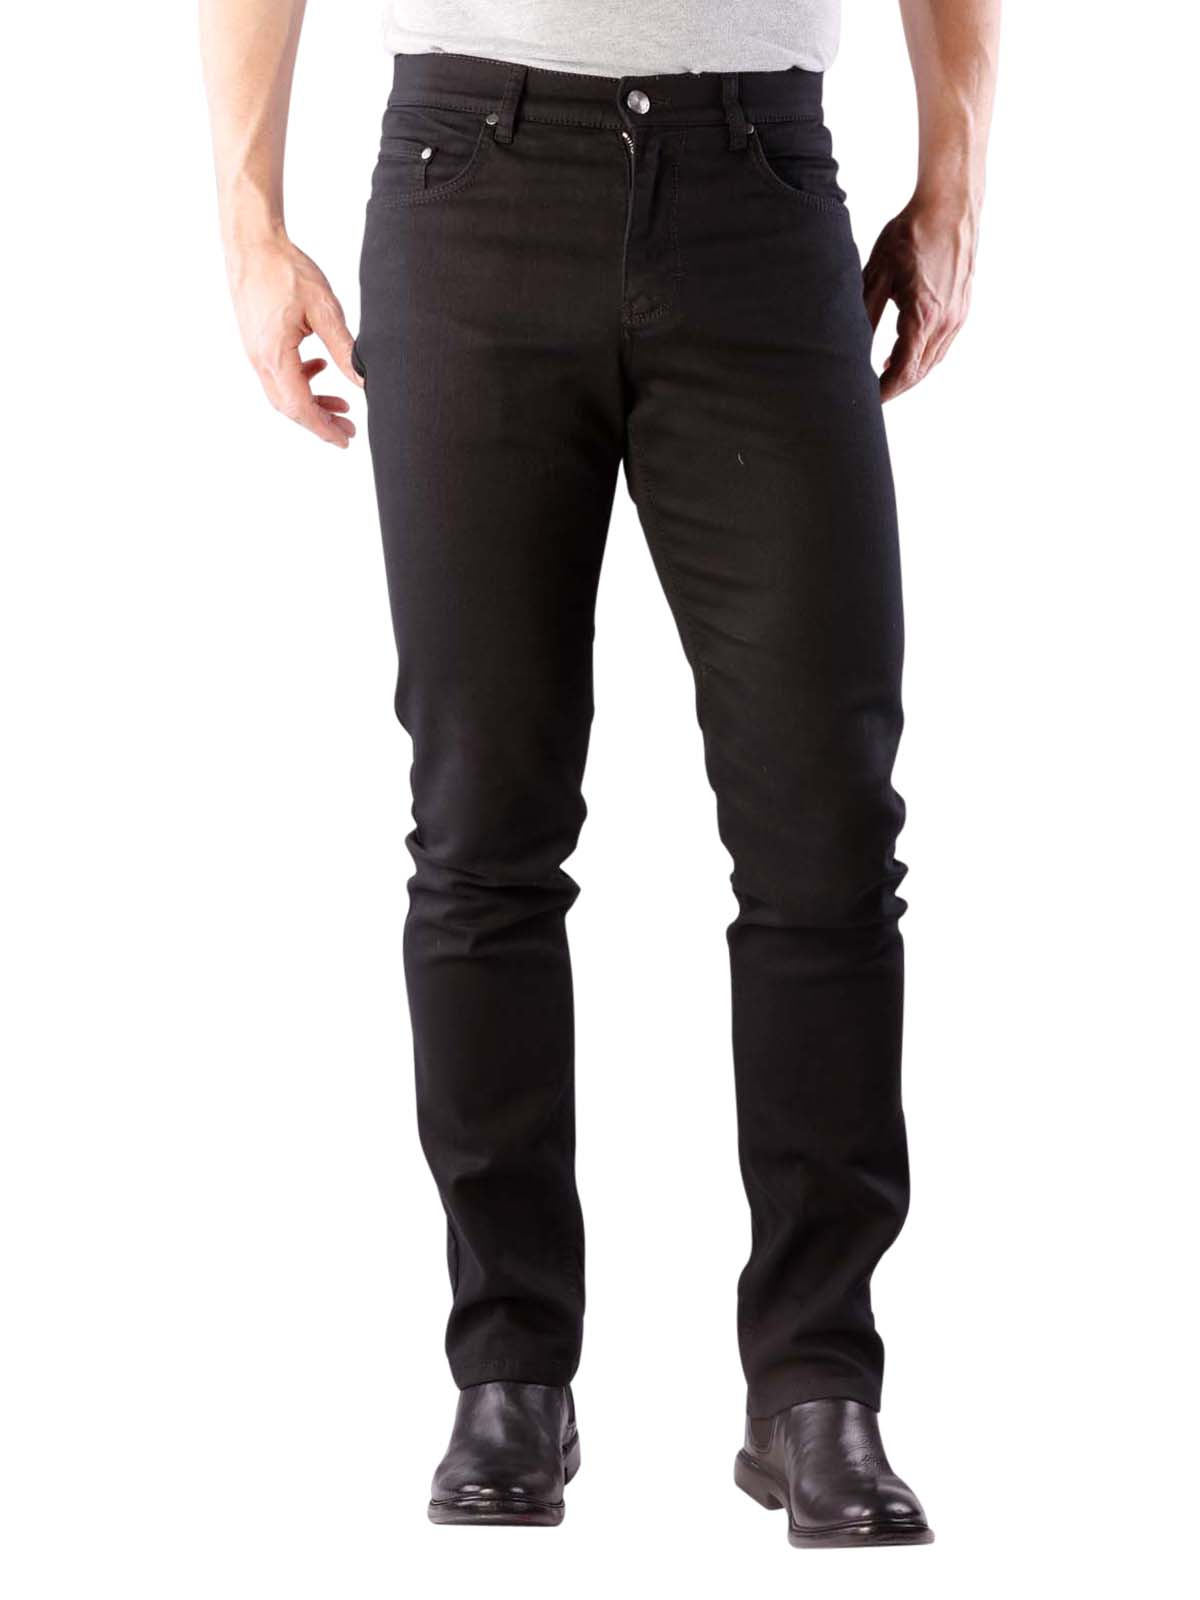 Brax Cooper Denim Jeans black Brax Men's Jeans | Free